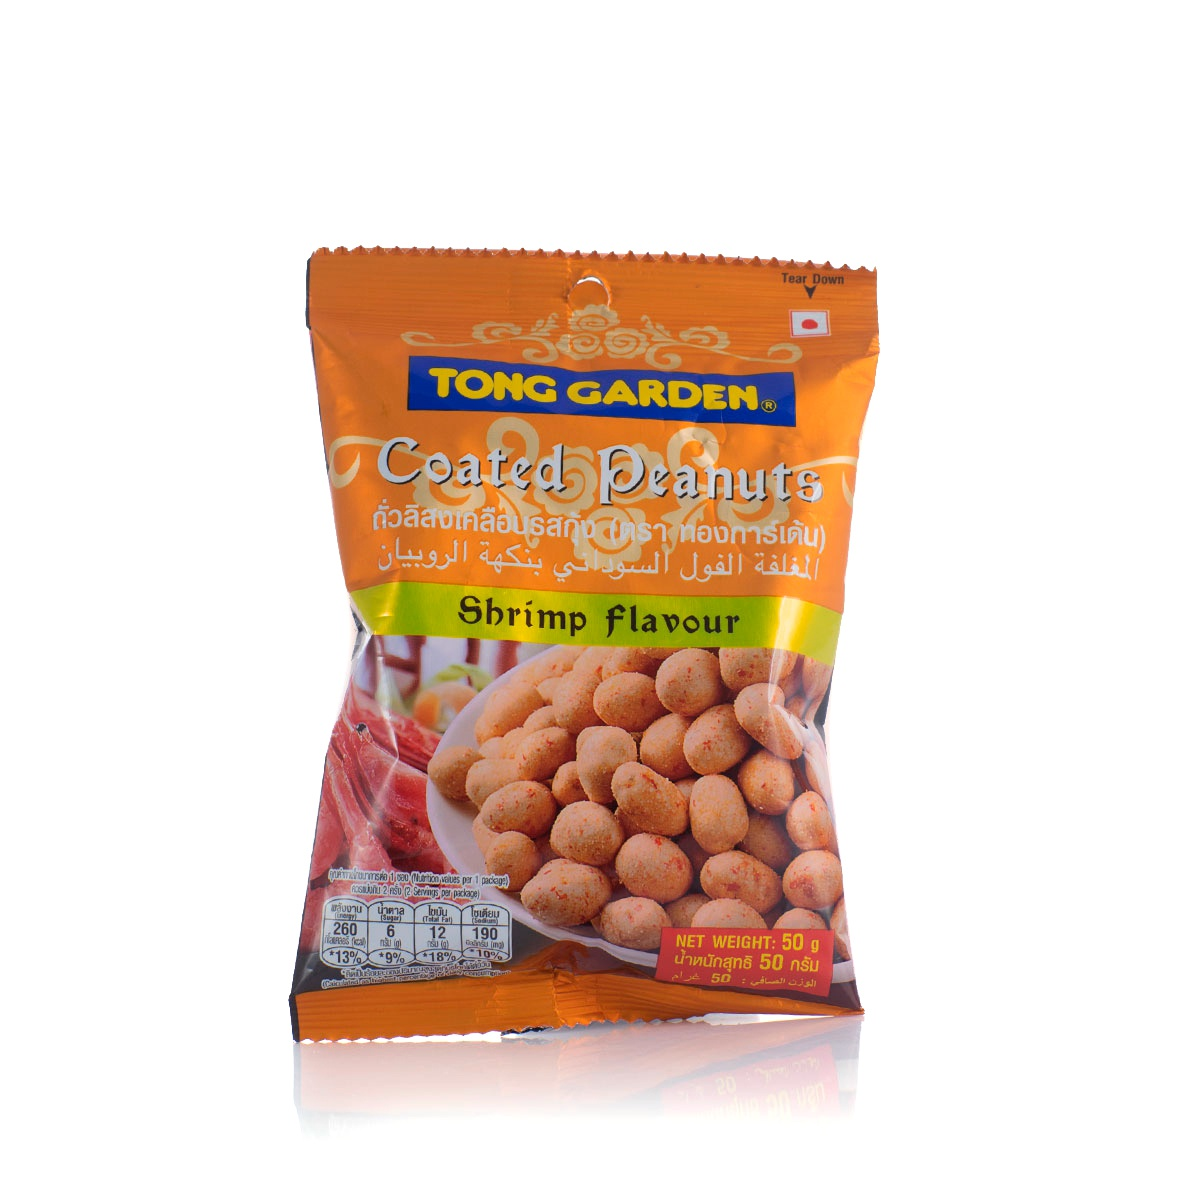 Tong Garden C. Peanuts Shrimp 50G - in Sri Lanka